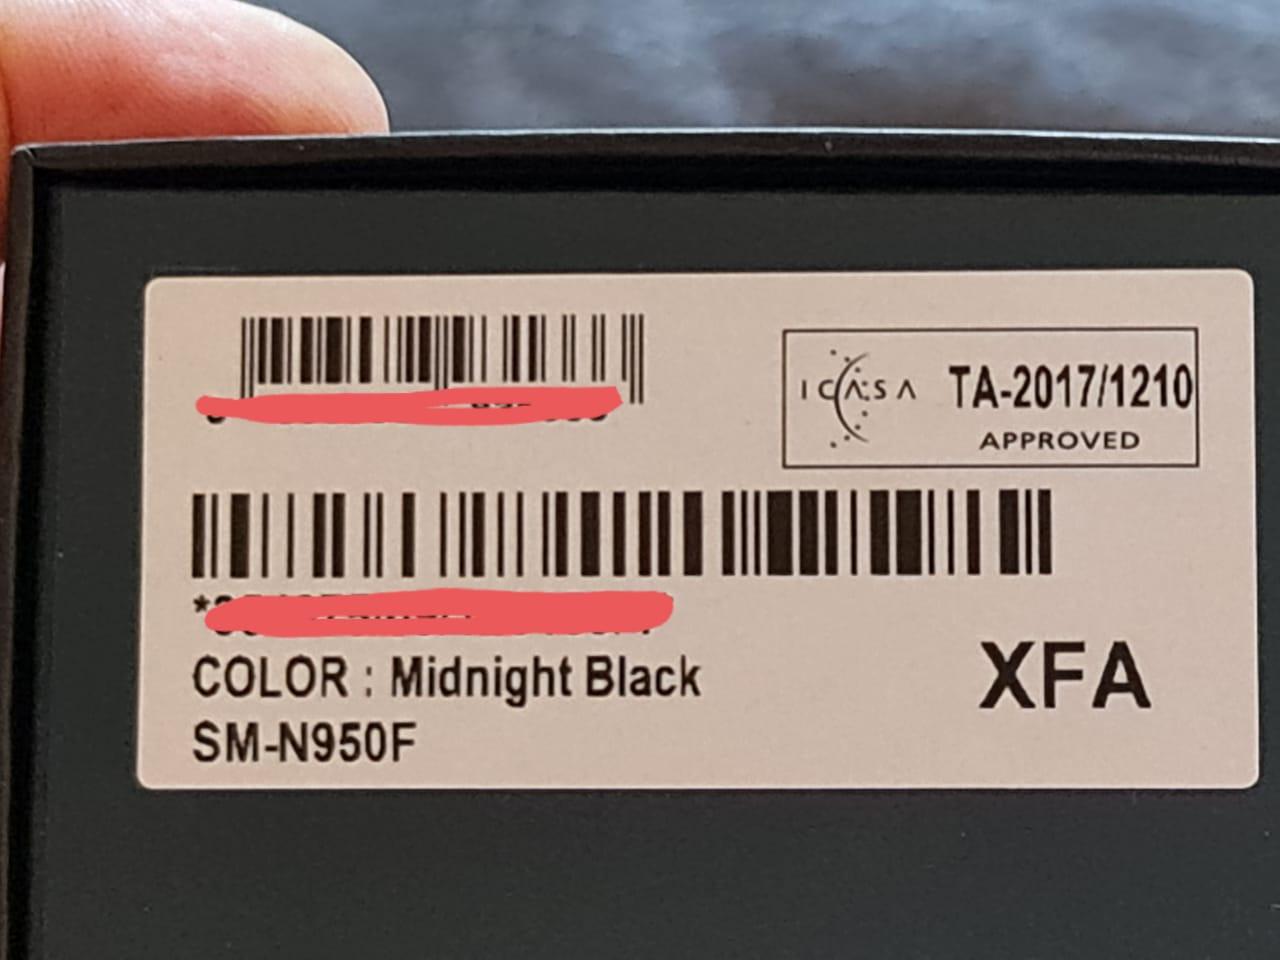 Samsung Galaxy Note 8 - Refurbished